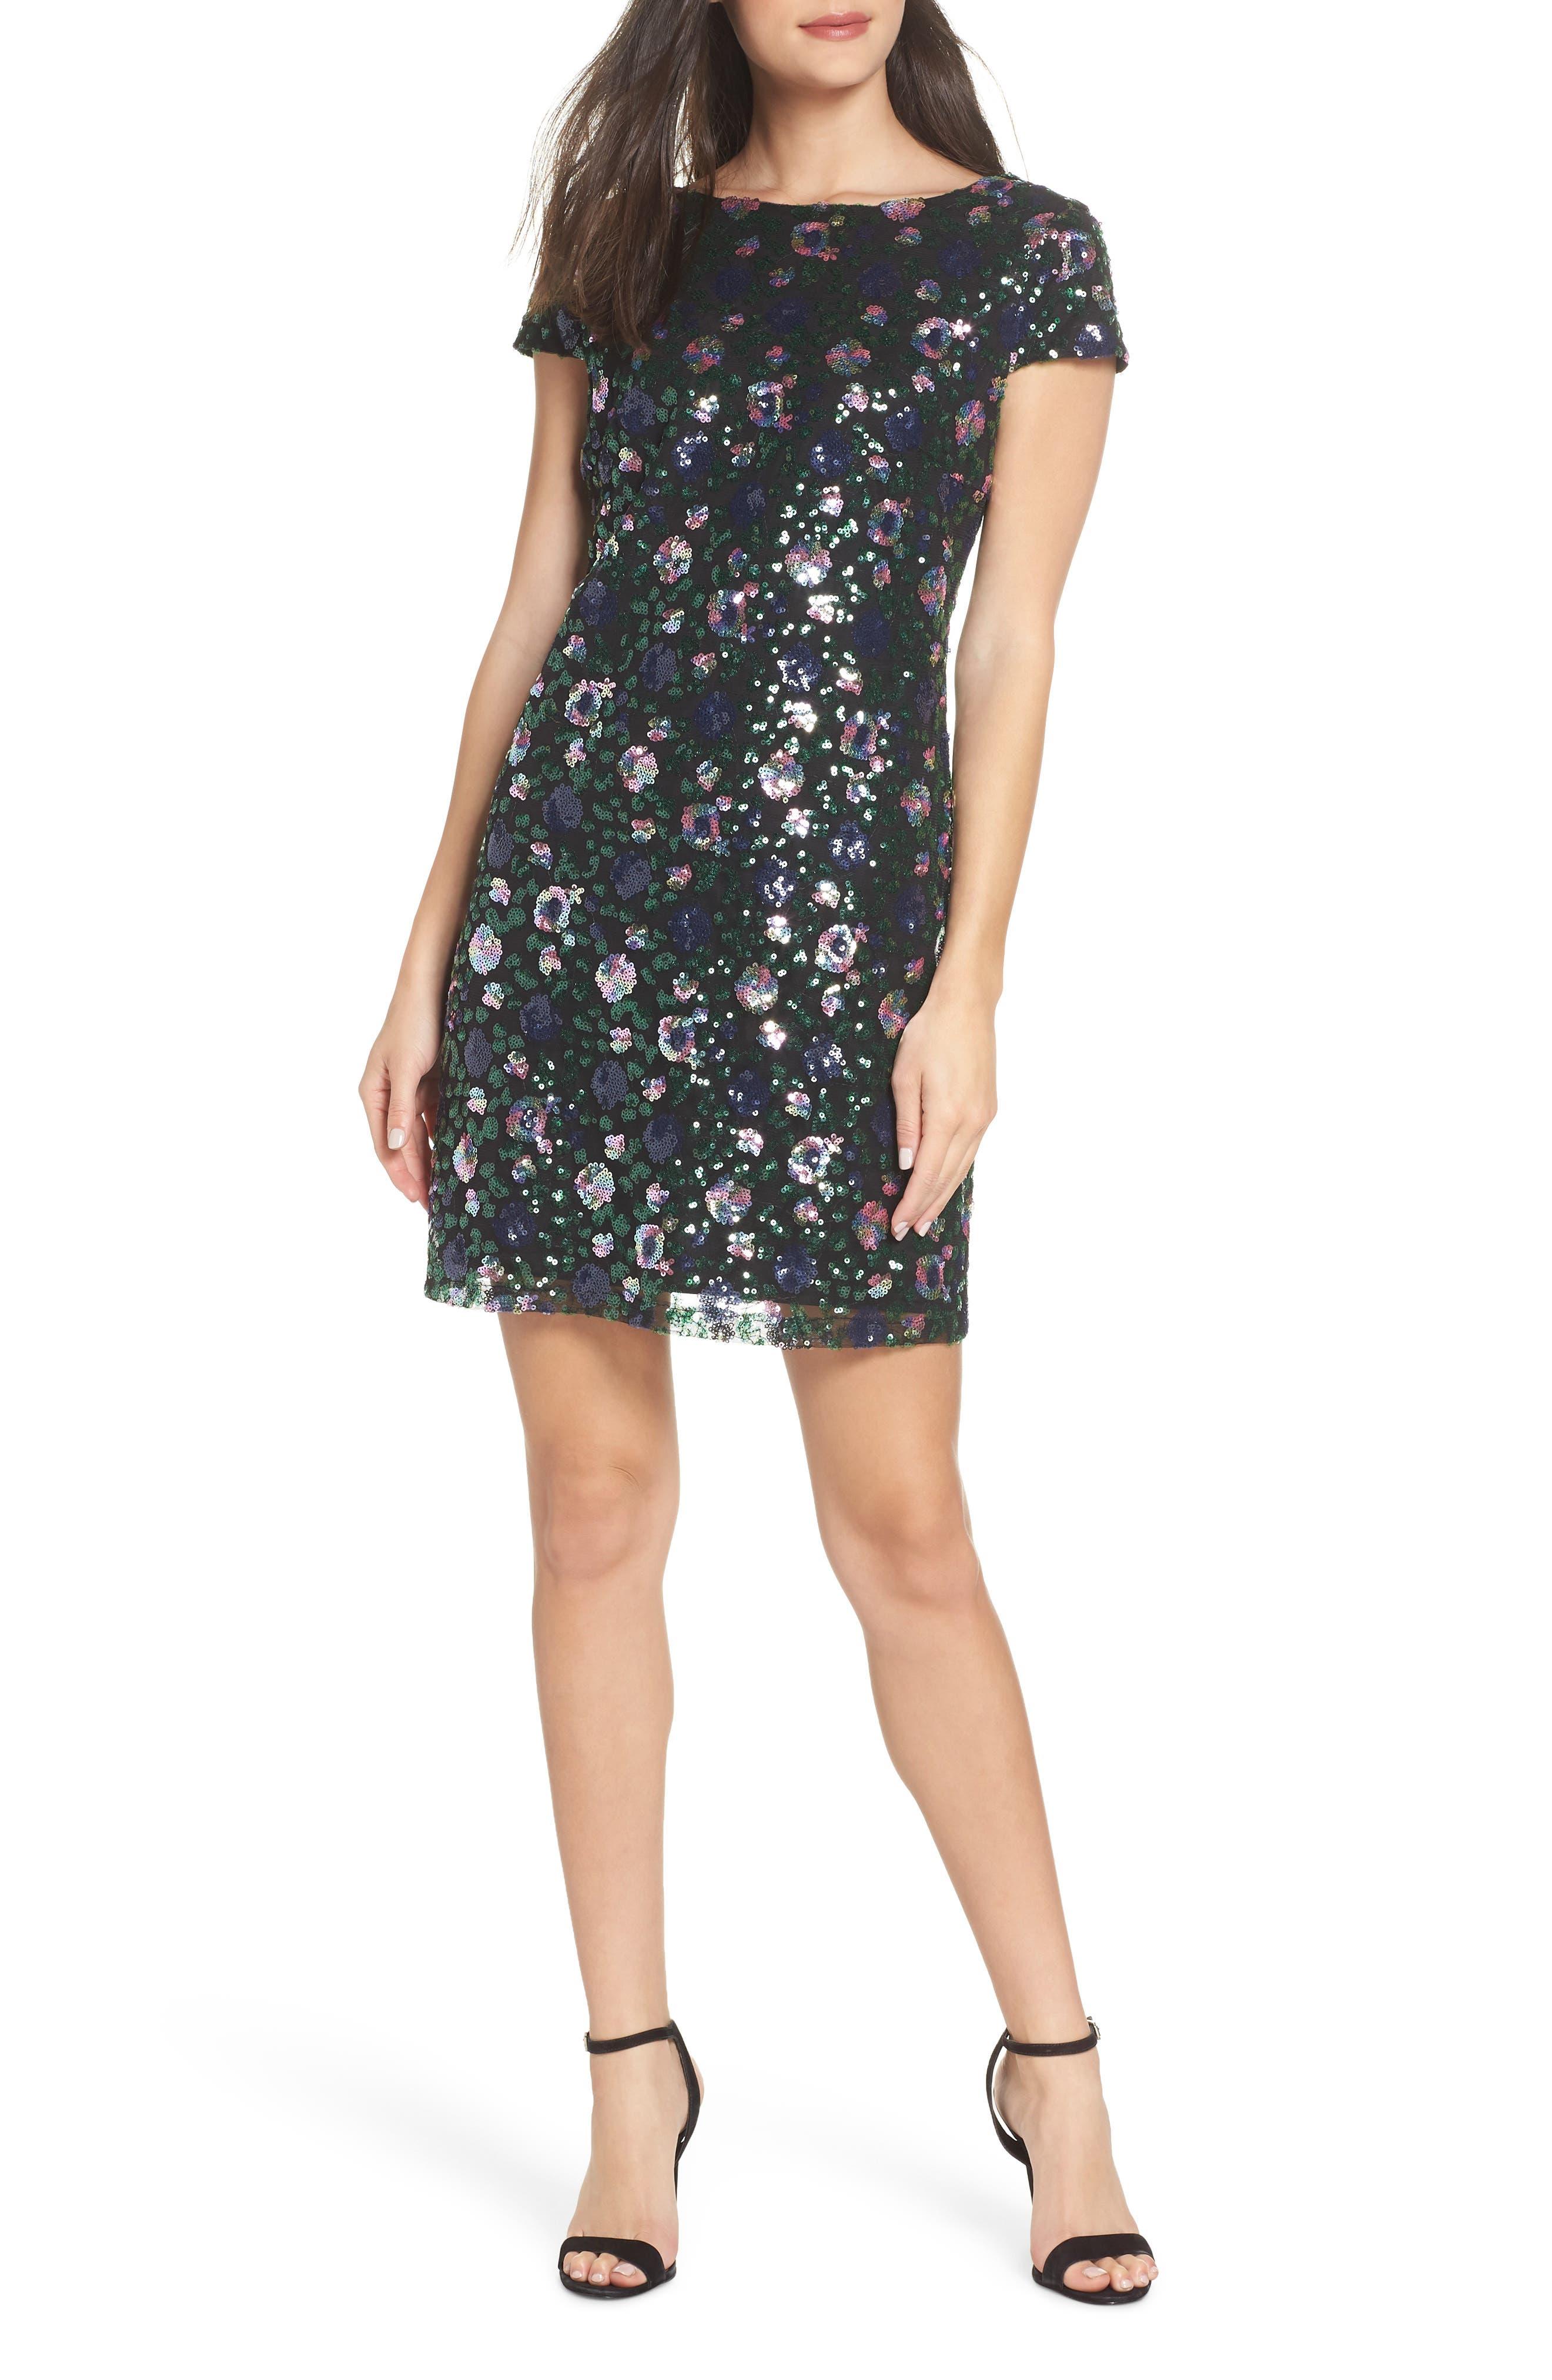 Floral Sequin Sheath Dress,                             Main thumbnail 1, color,                             PURPLE/ GREEN